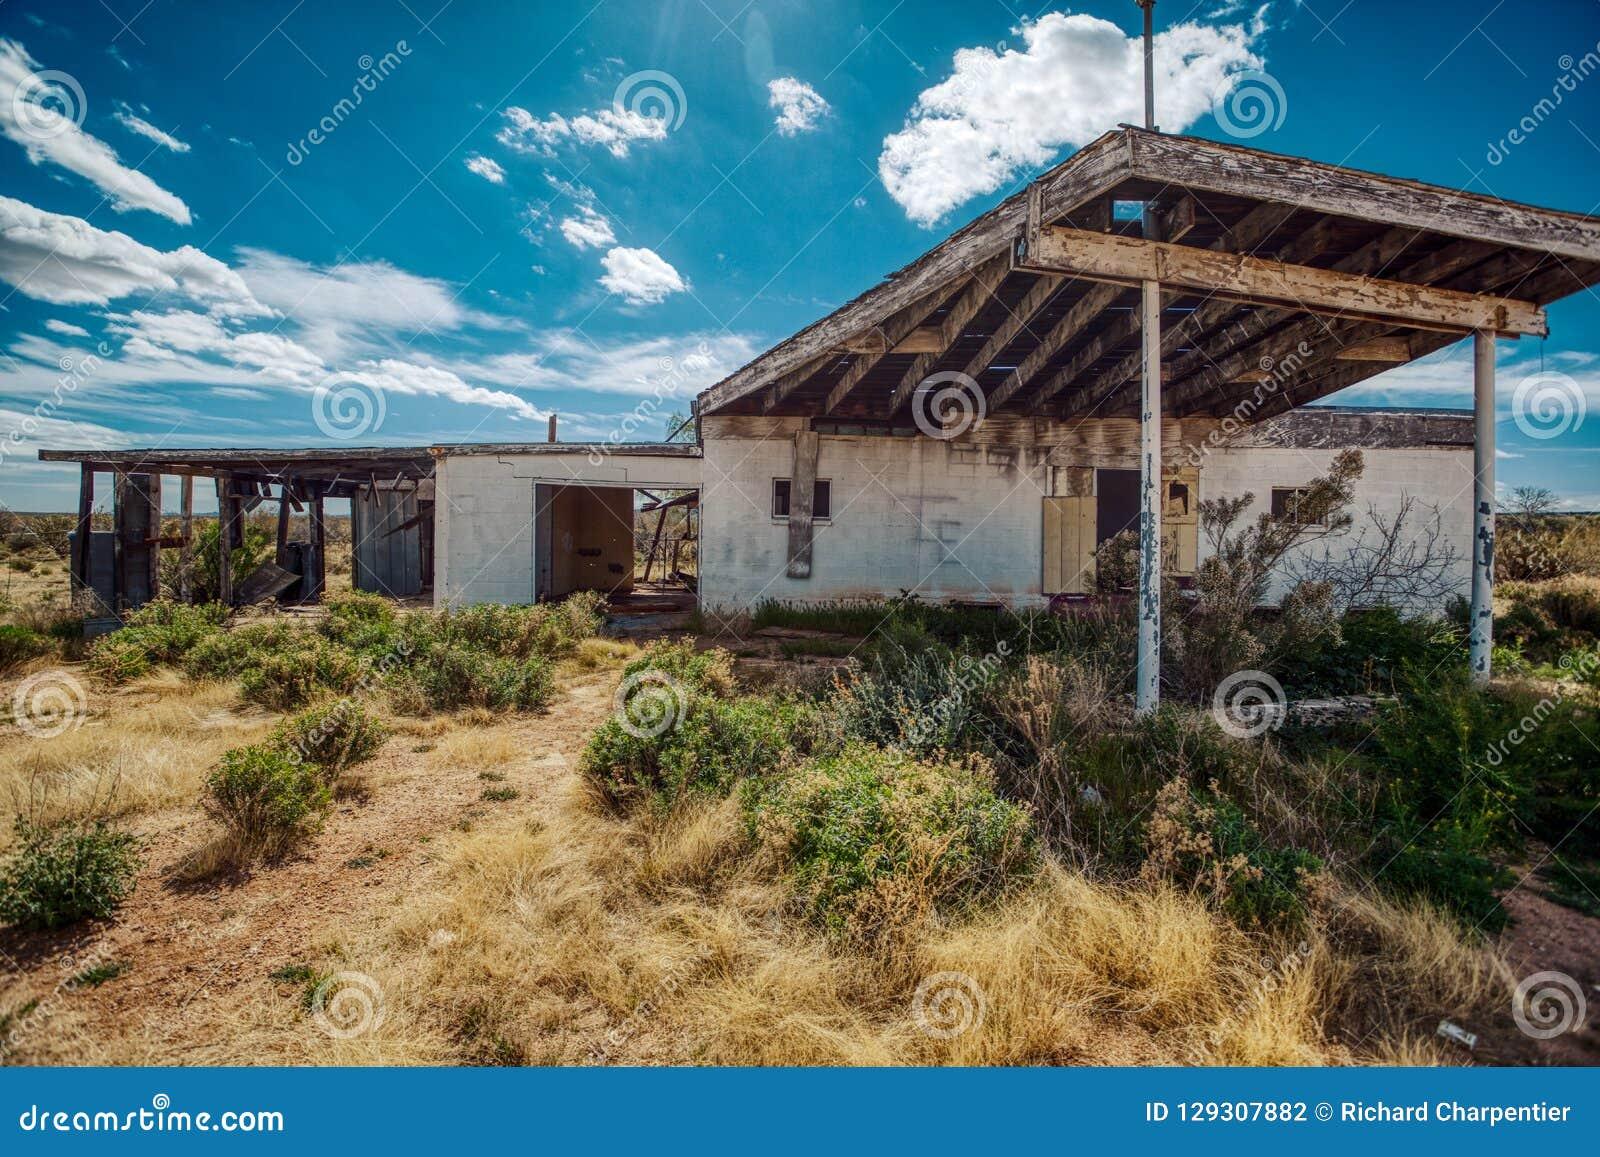 Abandoned Gas Station Rots Away Under The Arizona Sun Stock Photo Image Of Mojave California 129307882